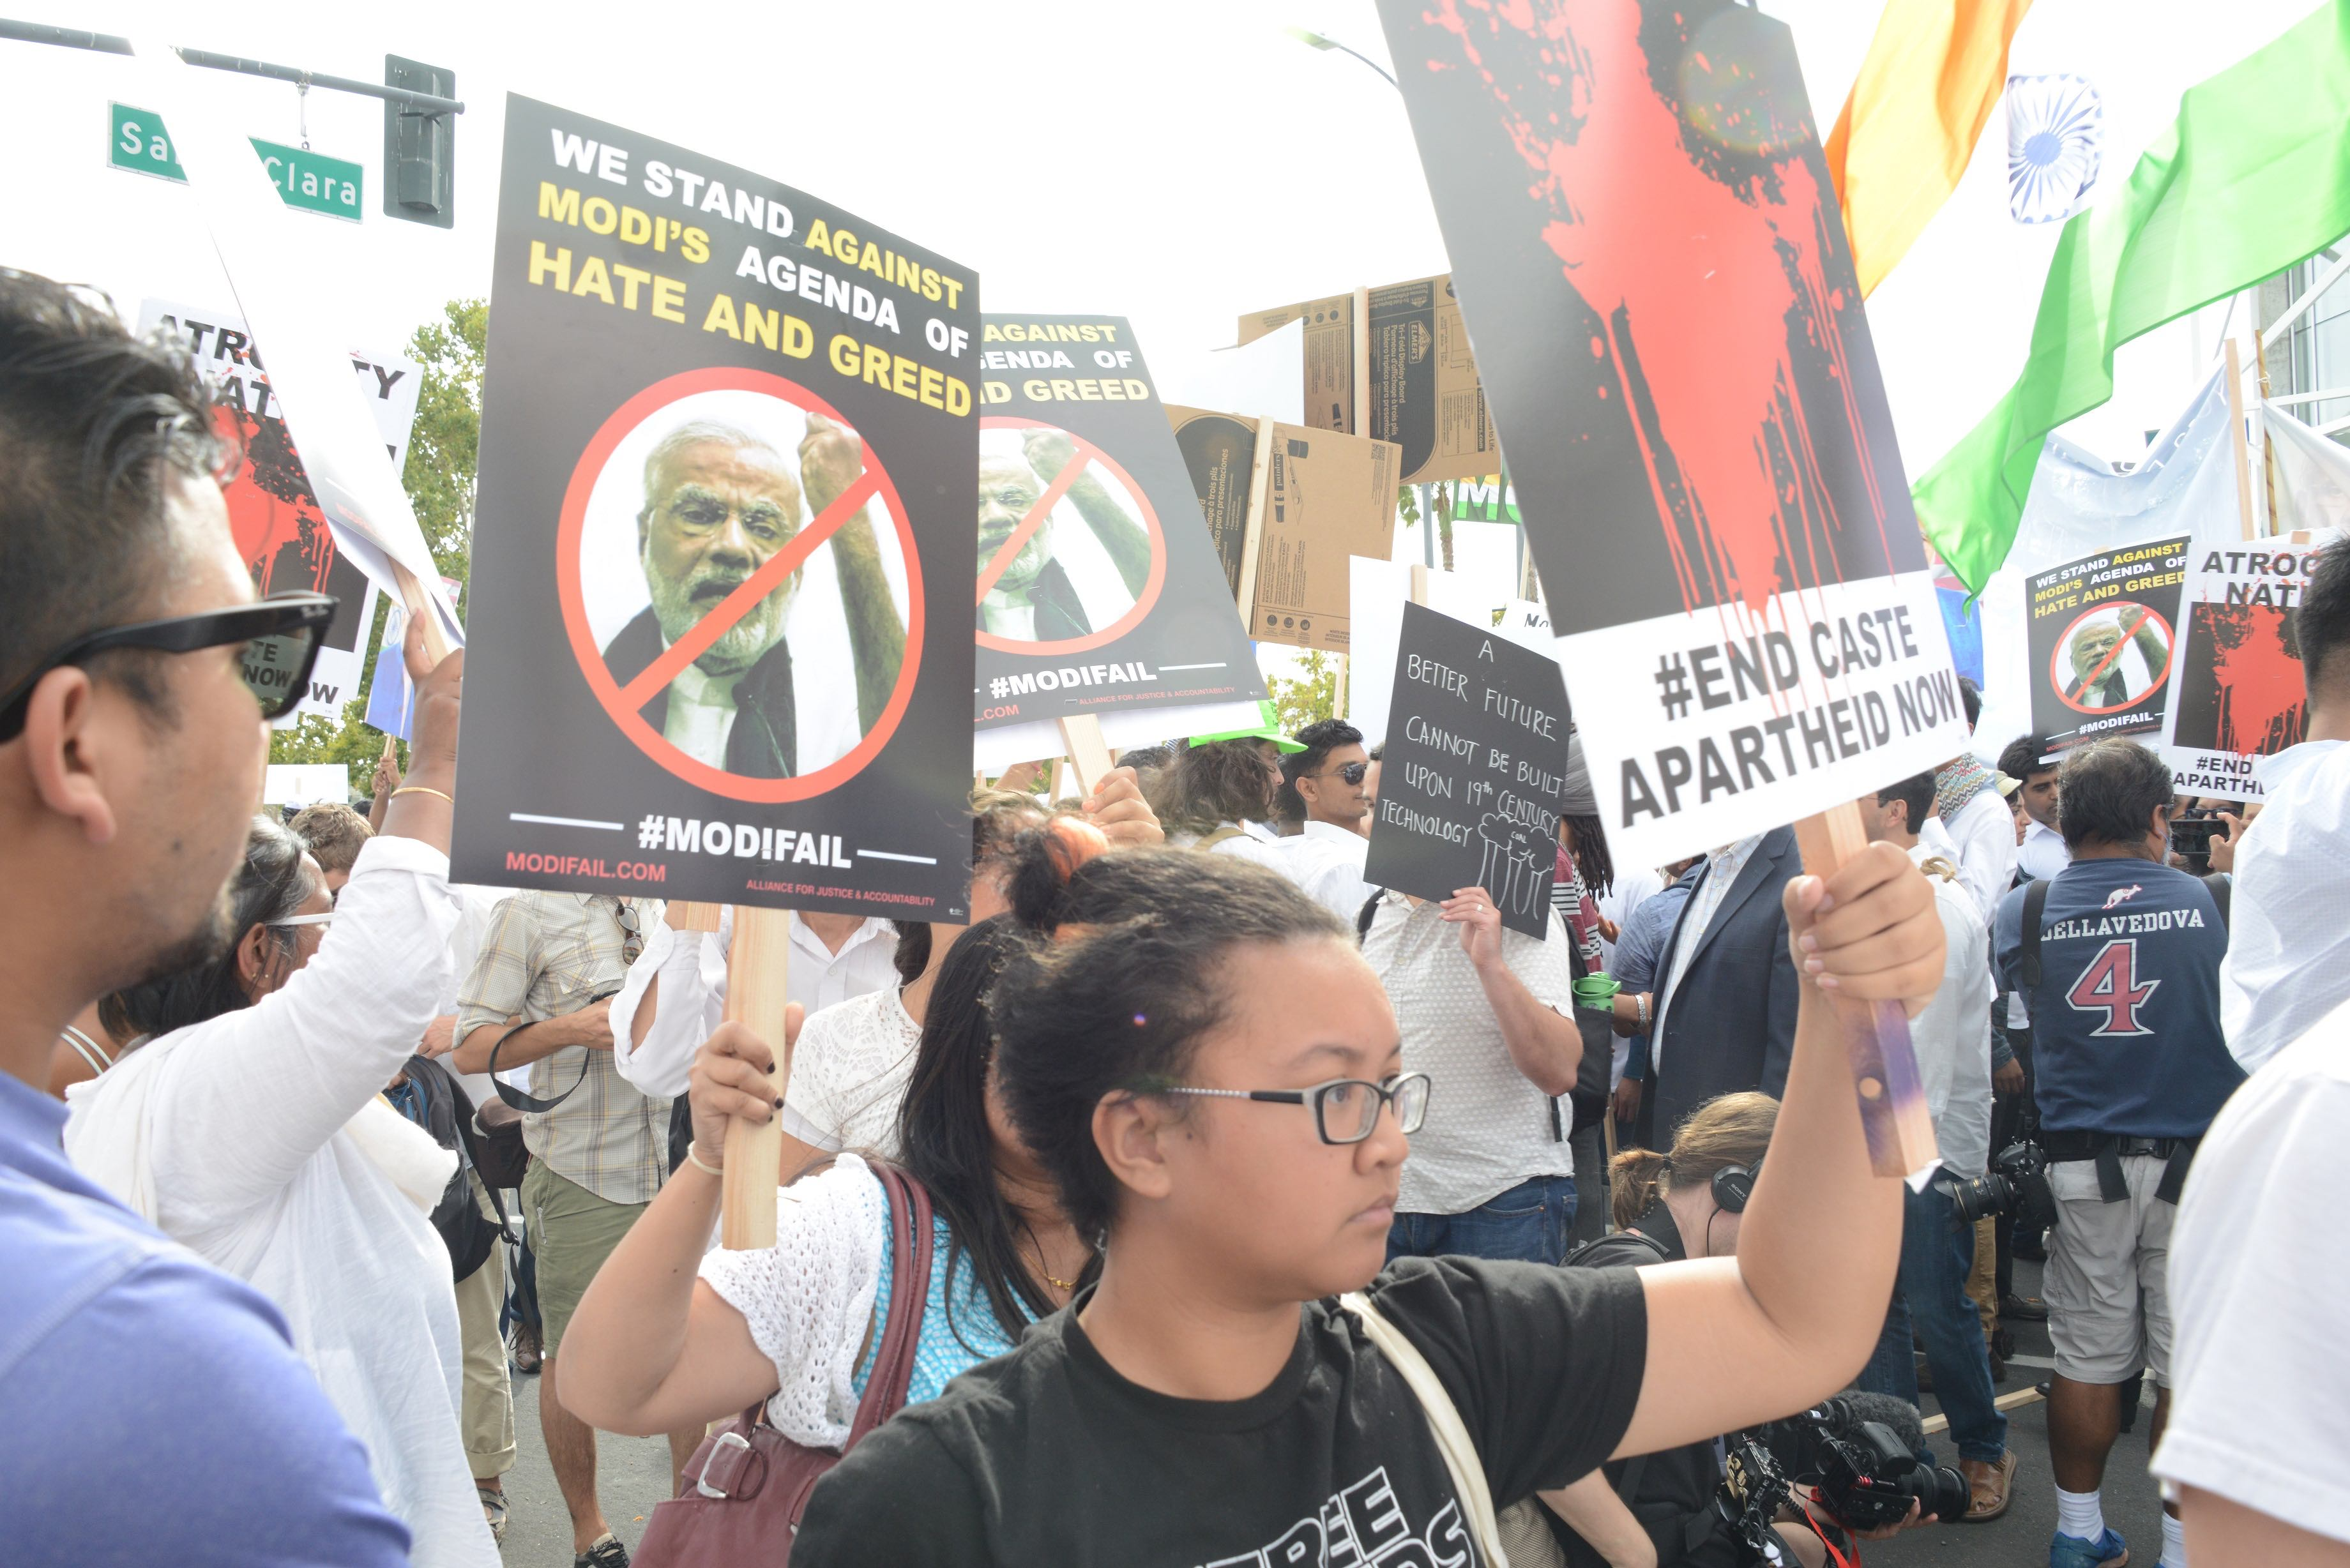 Indian-Americans across US join #NotInMyName solidarity